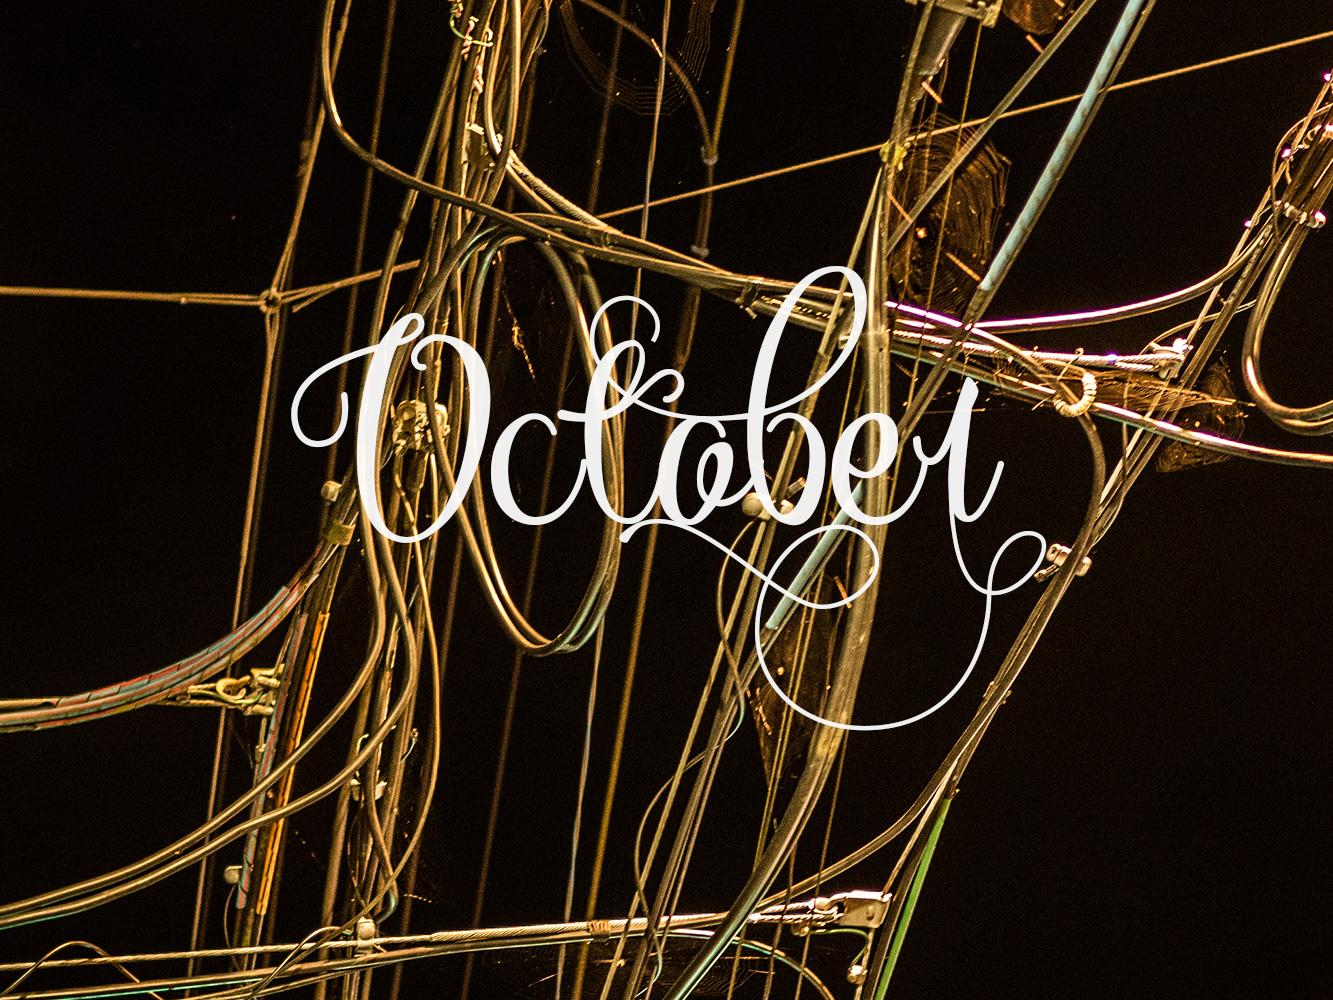 2016年10月